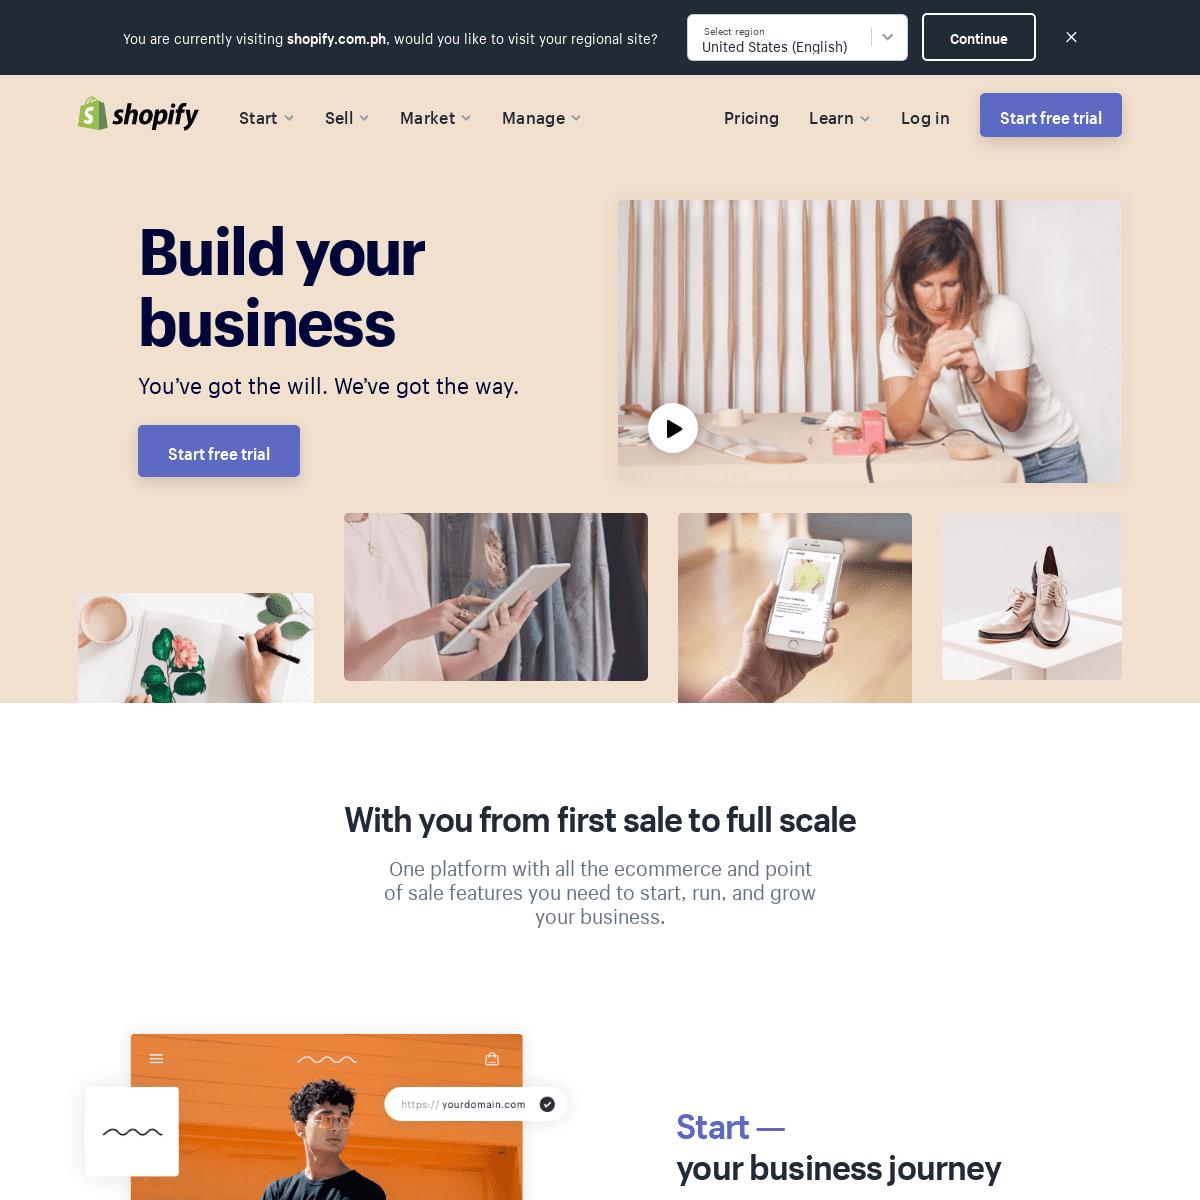 ArchiveBay.com - shopify.com.ph - Ecommerce Software - Best Ecommerce Platform Made for You - Free Trial